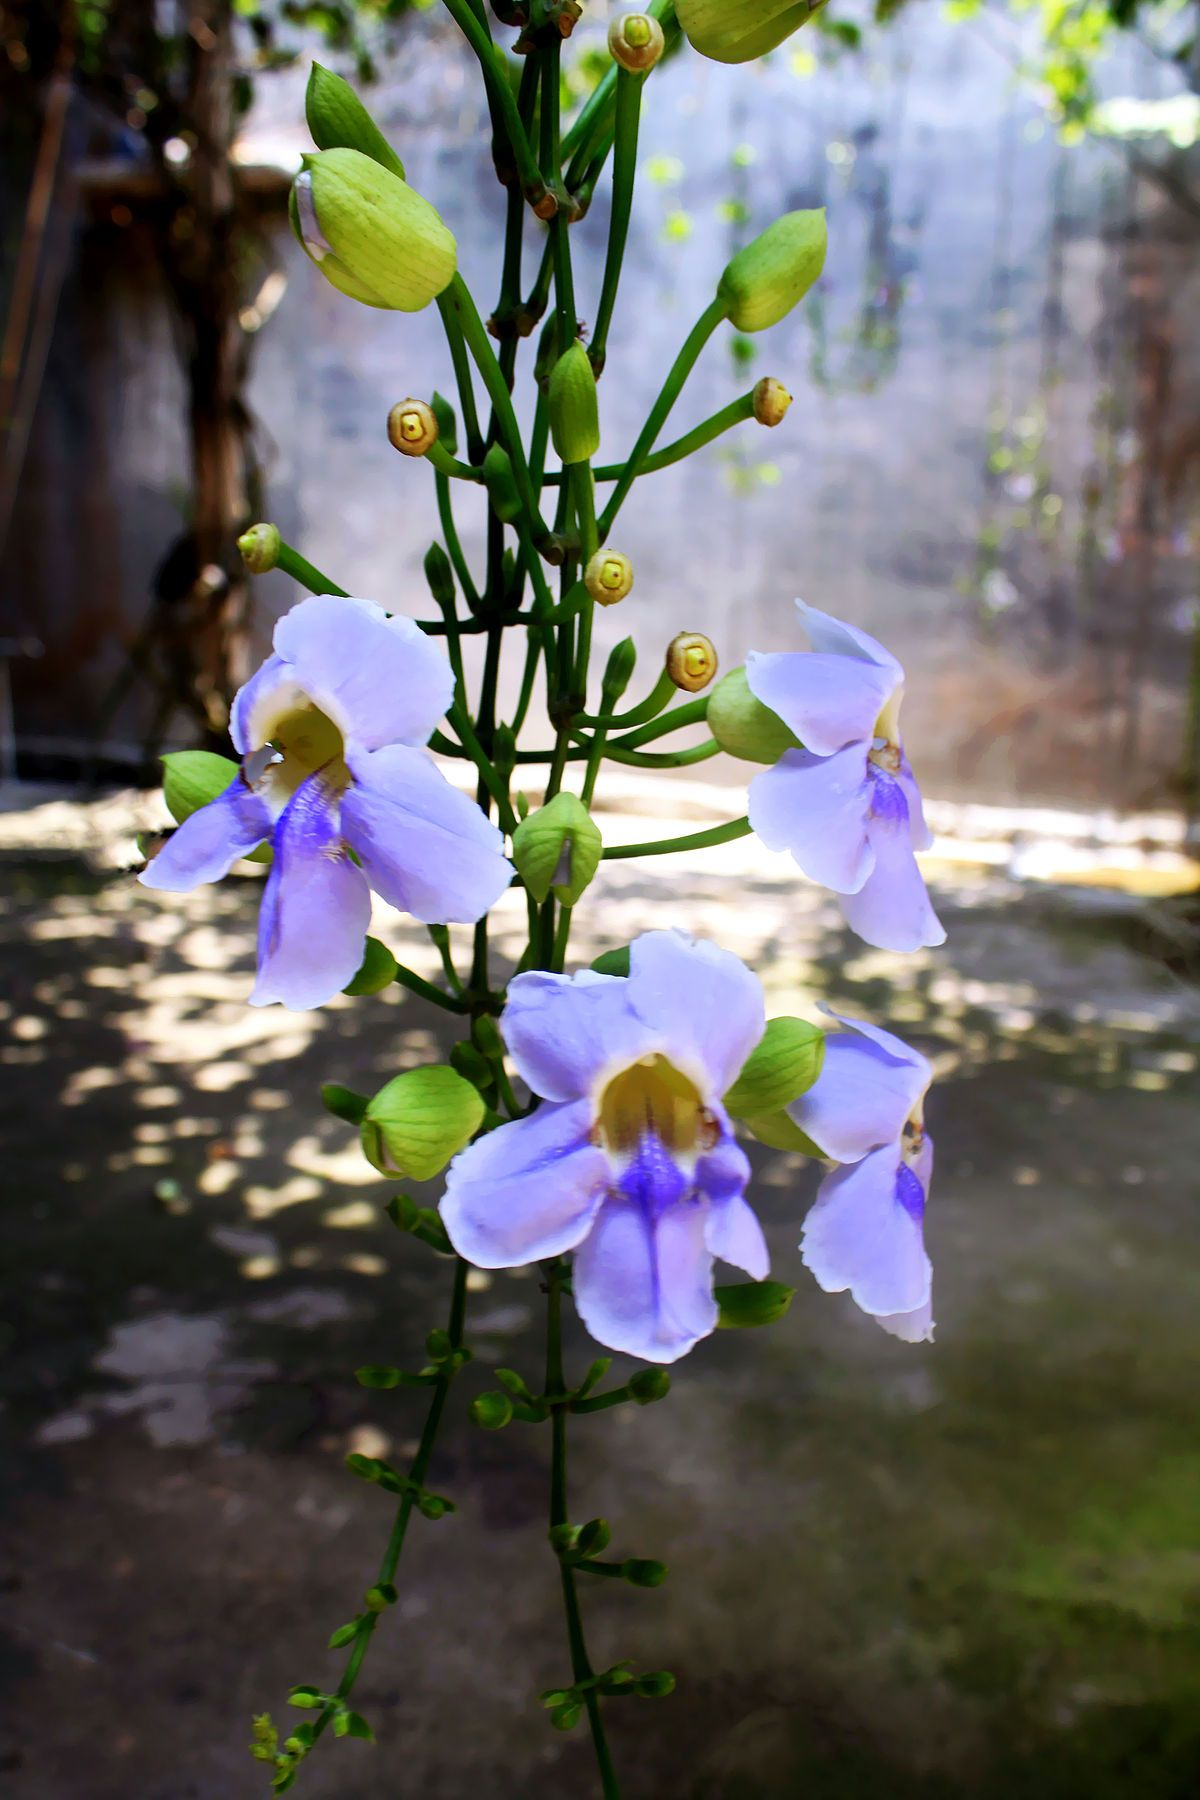 Thunbergia Grandiflora Wikipedia Blue Flower Names Types Of Blue Flowers Flowers Names And Pictures